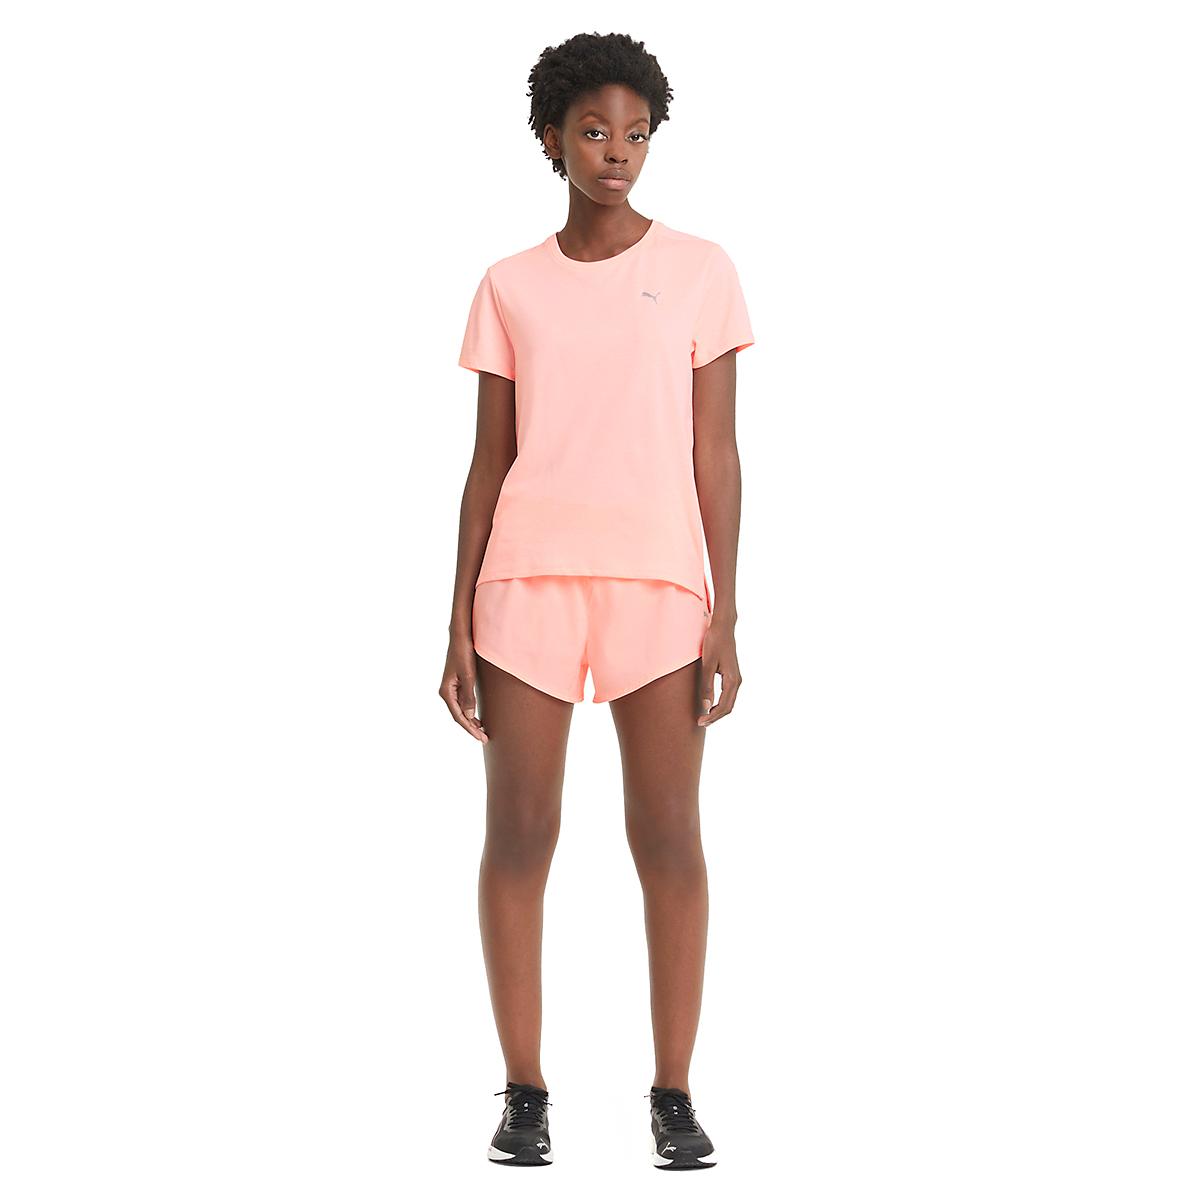 Women's Puma Favorite Heather Short Sleeve Running Tee - Color: Elektro Peach Heather - Size: XS, Elektro Peach Heather, large, image 3